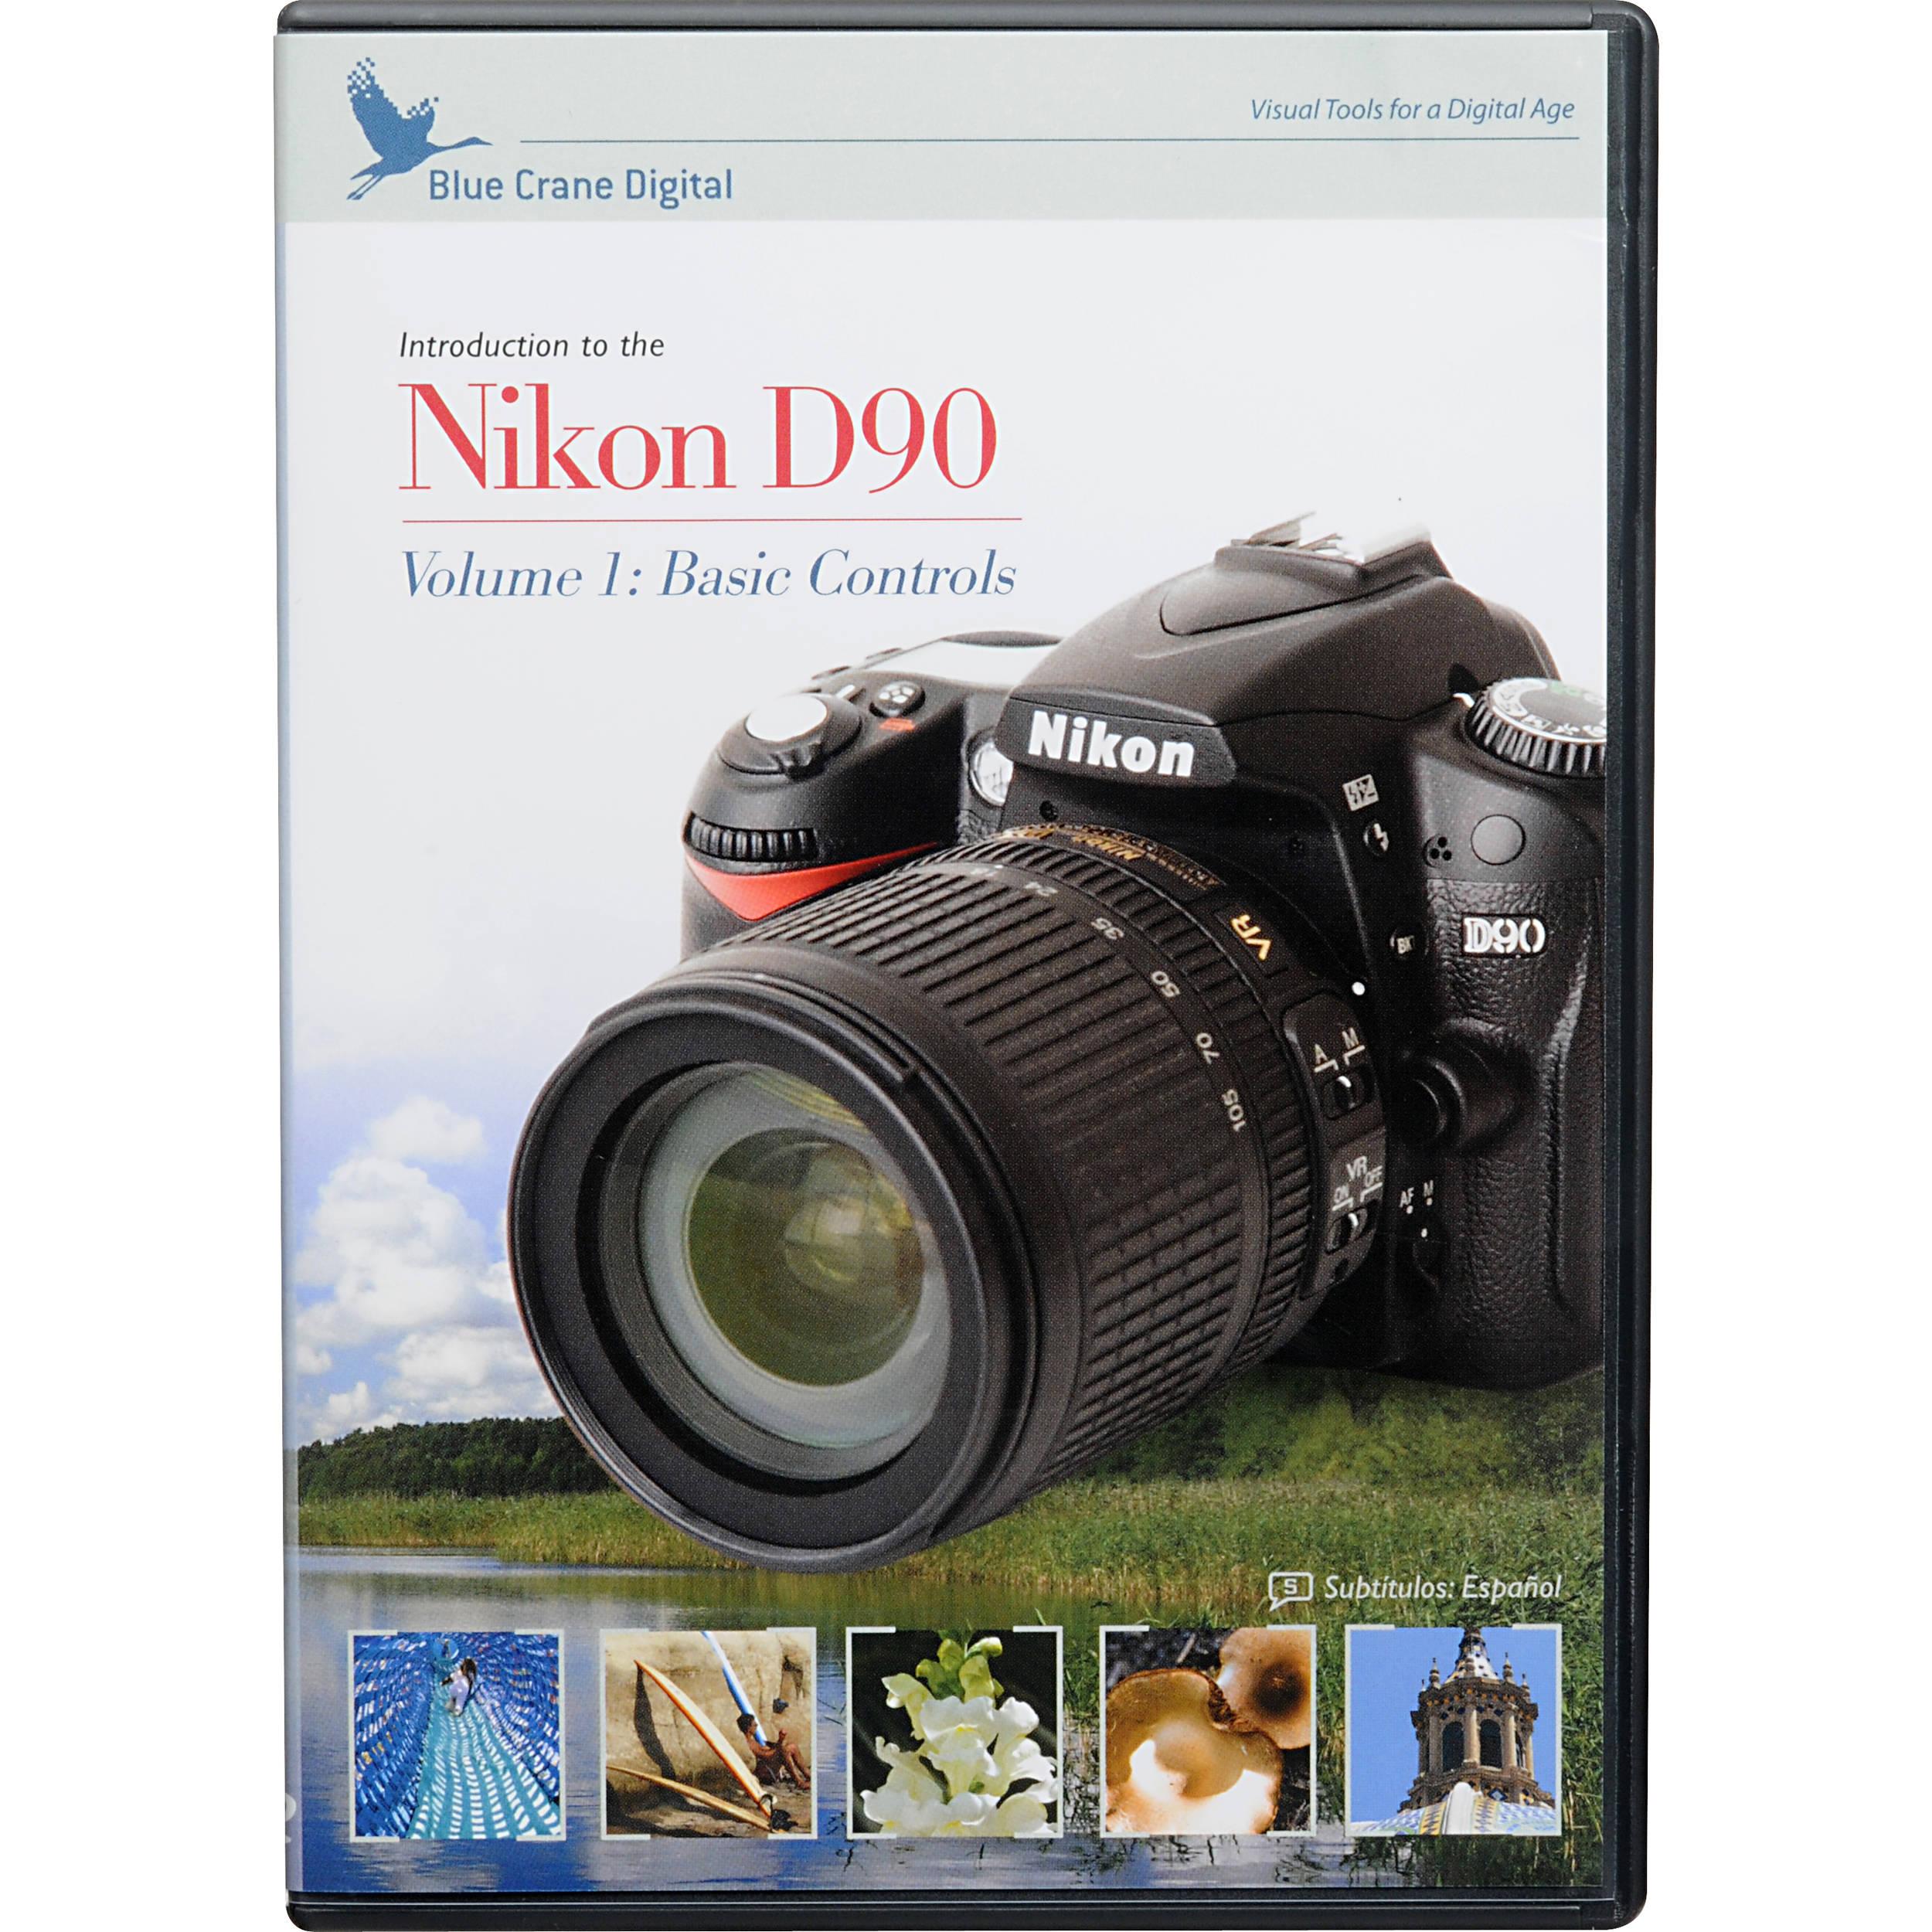 Blue Crane Digital DVD: Training DVD for the Nikon D90 Digital SLR Camera  (Volume